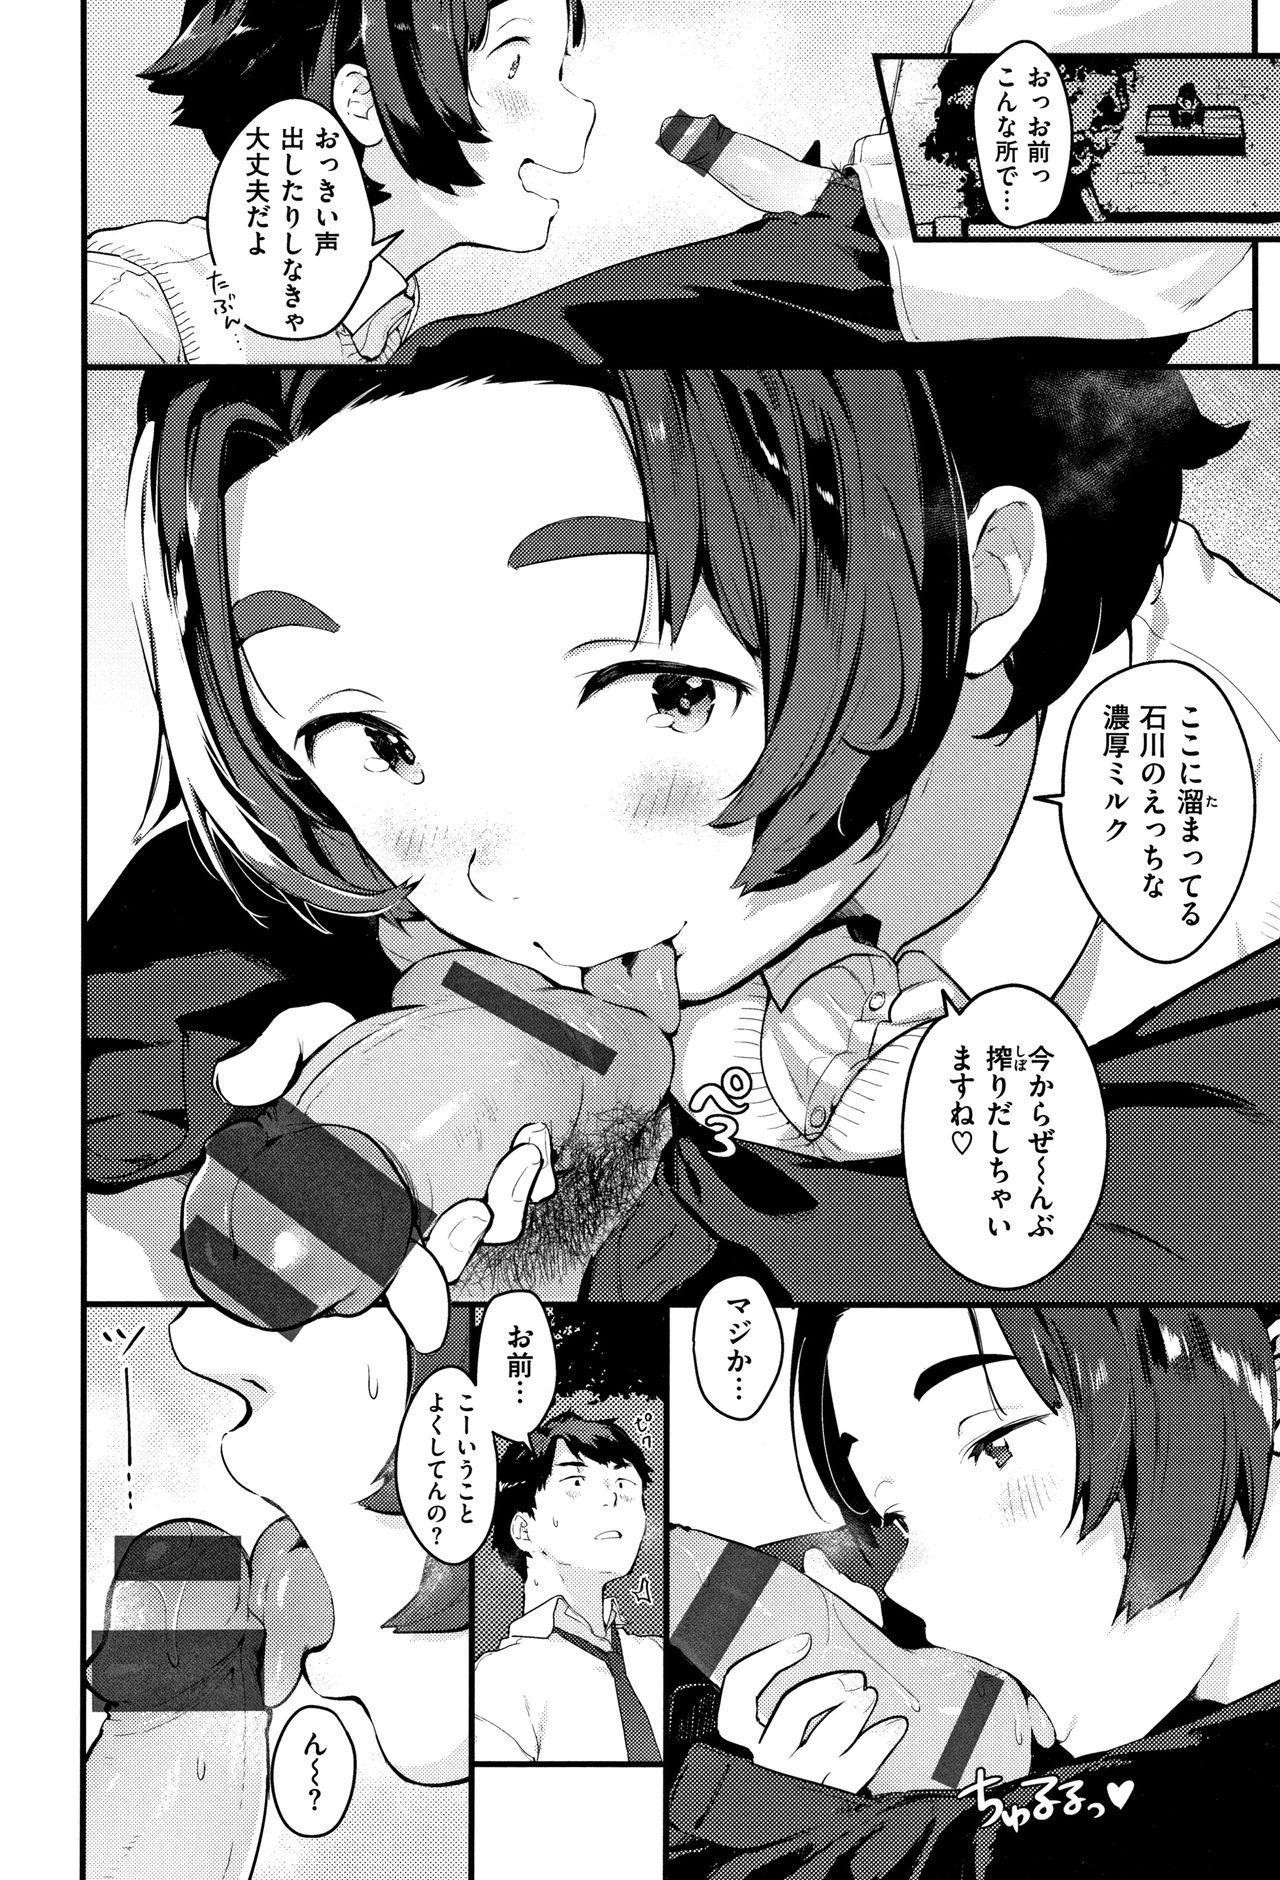 Haru to Ao - Our adolescence 74